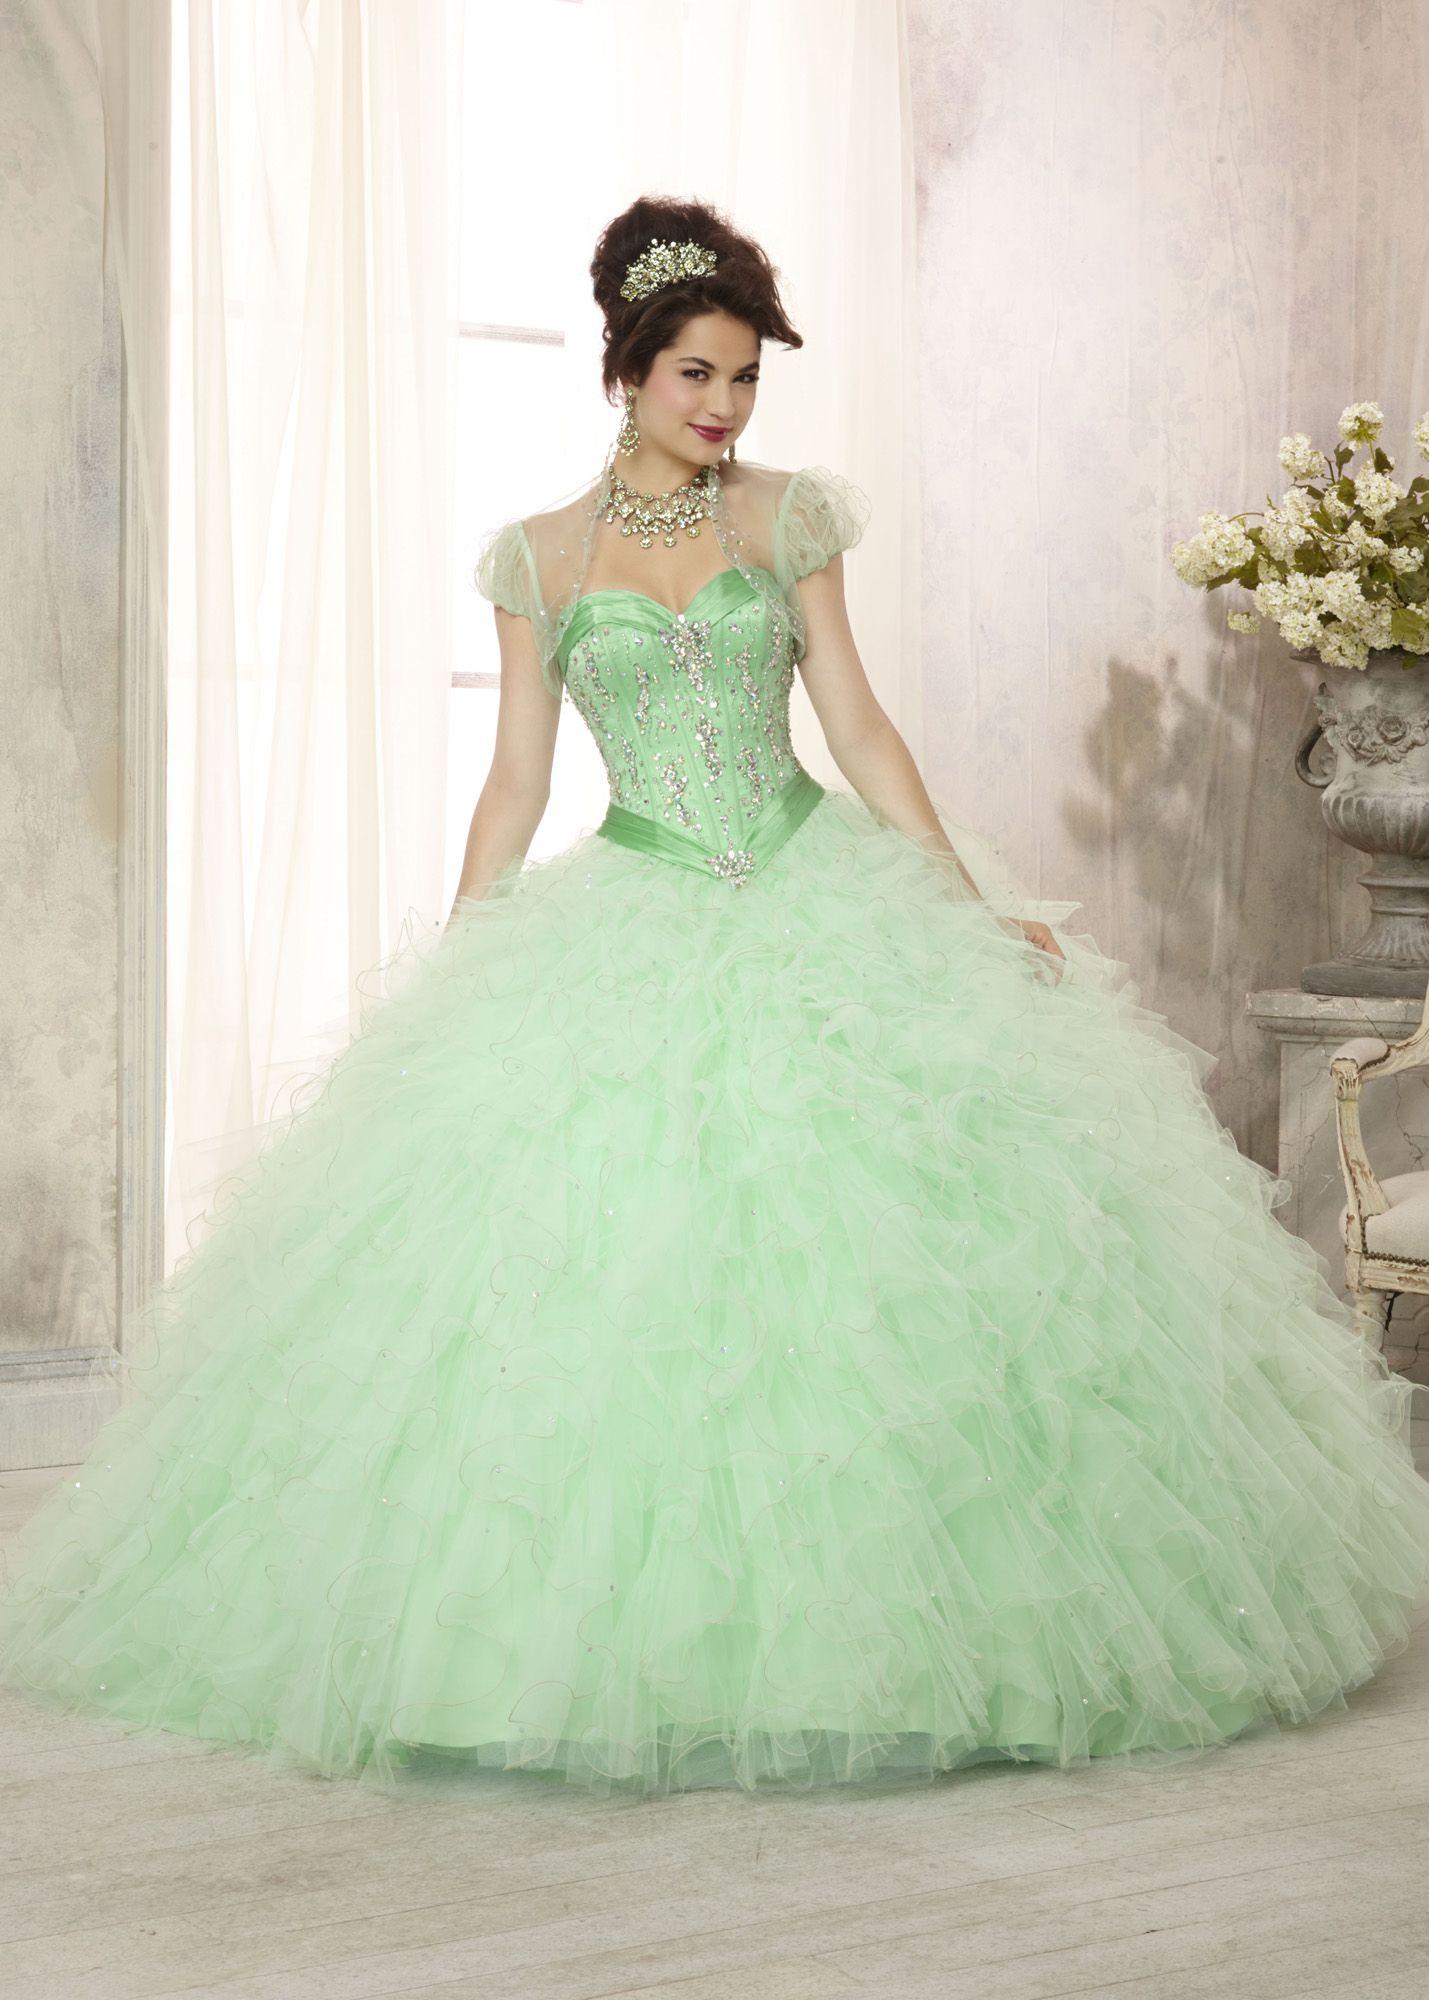 b7c8a3144 Vestidos de princesa para fiesta de 15 años. Vizcaya 88085 - Mint Satin  Beaded Quinceanera Prom Dresses Online  thepromdresses